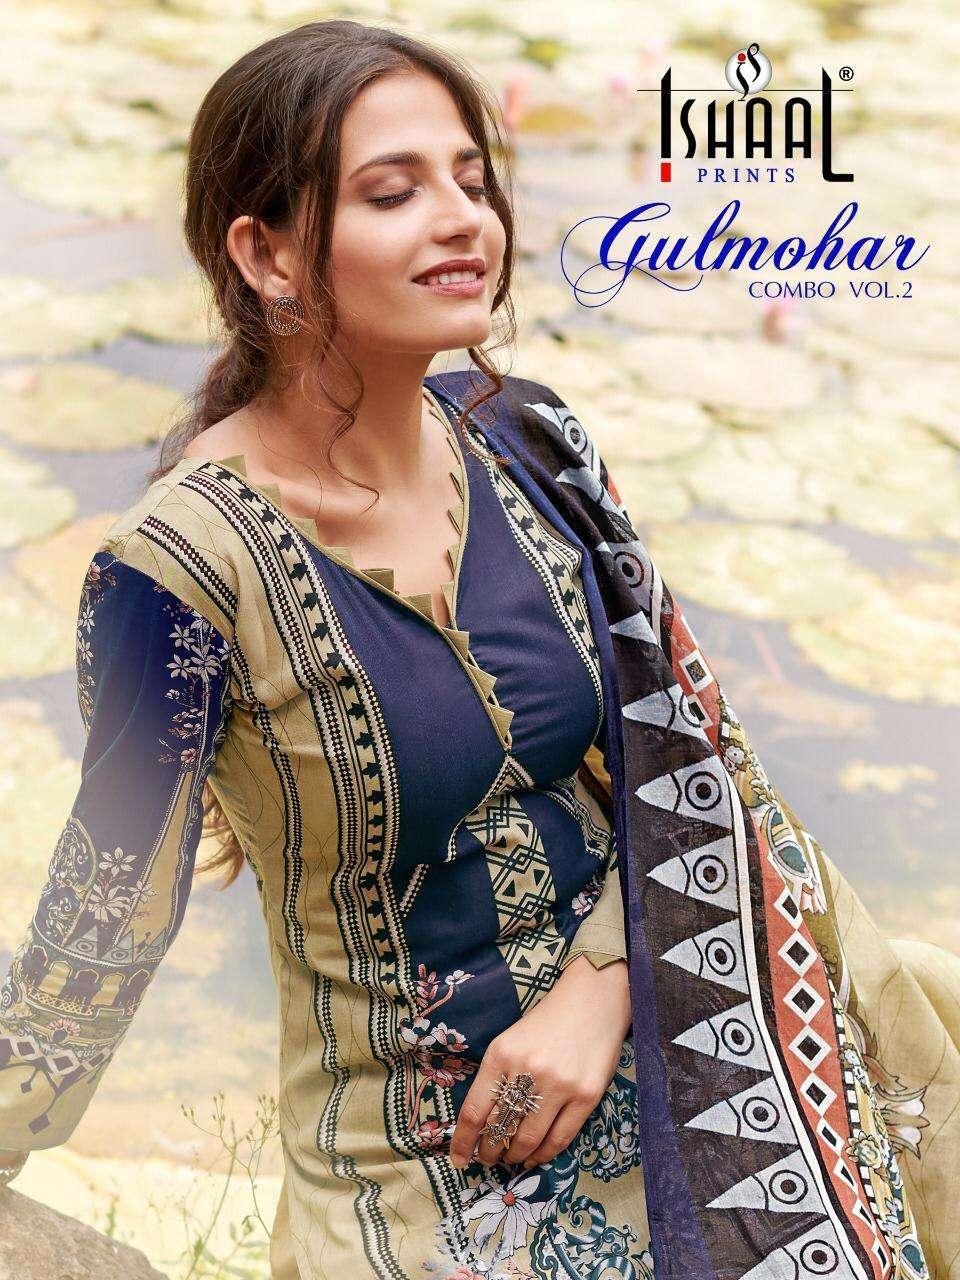 Ishaal Prints Gulmohar Combo Vol 2 Karachi Print Suit Catalog Buy Online